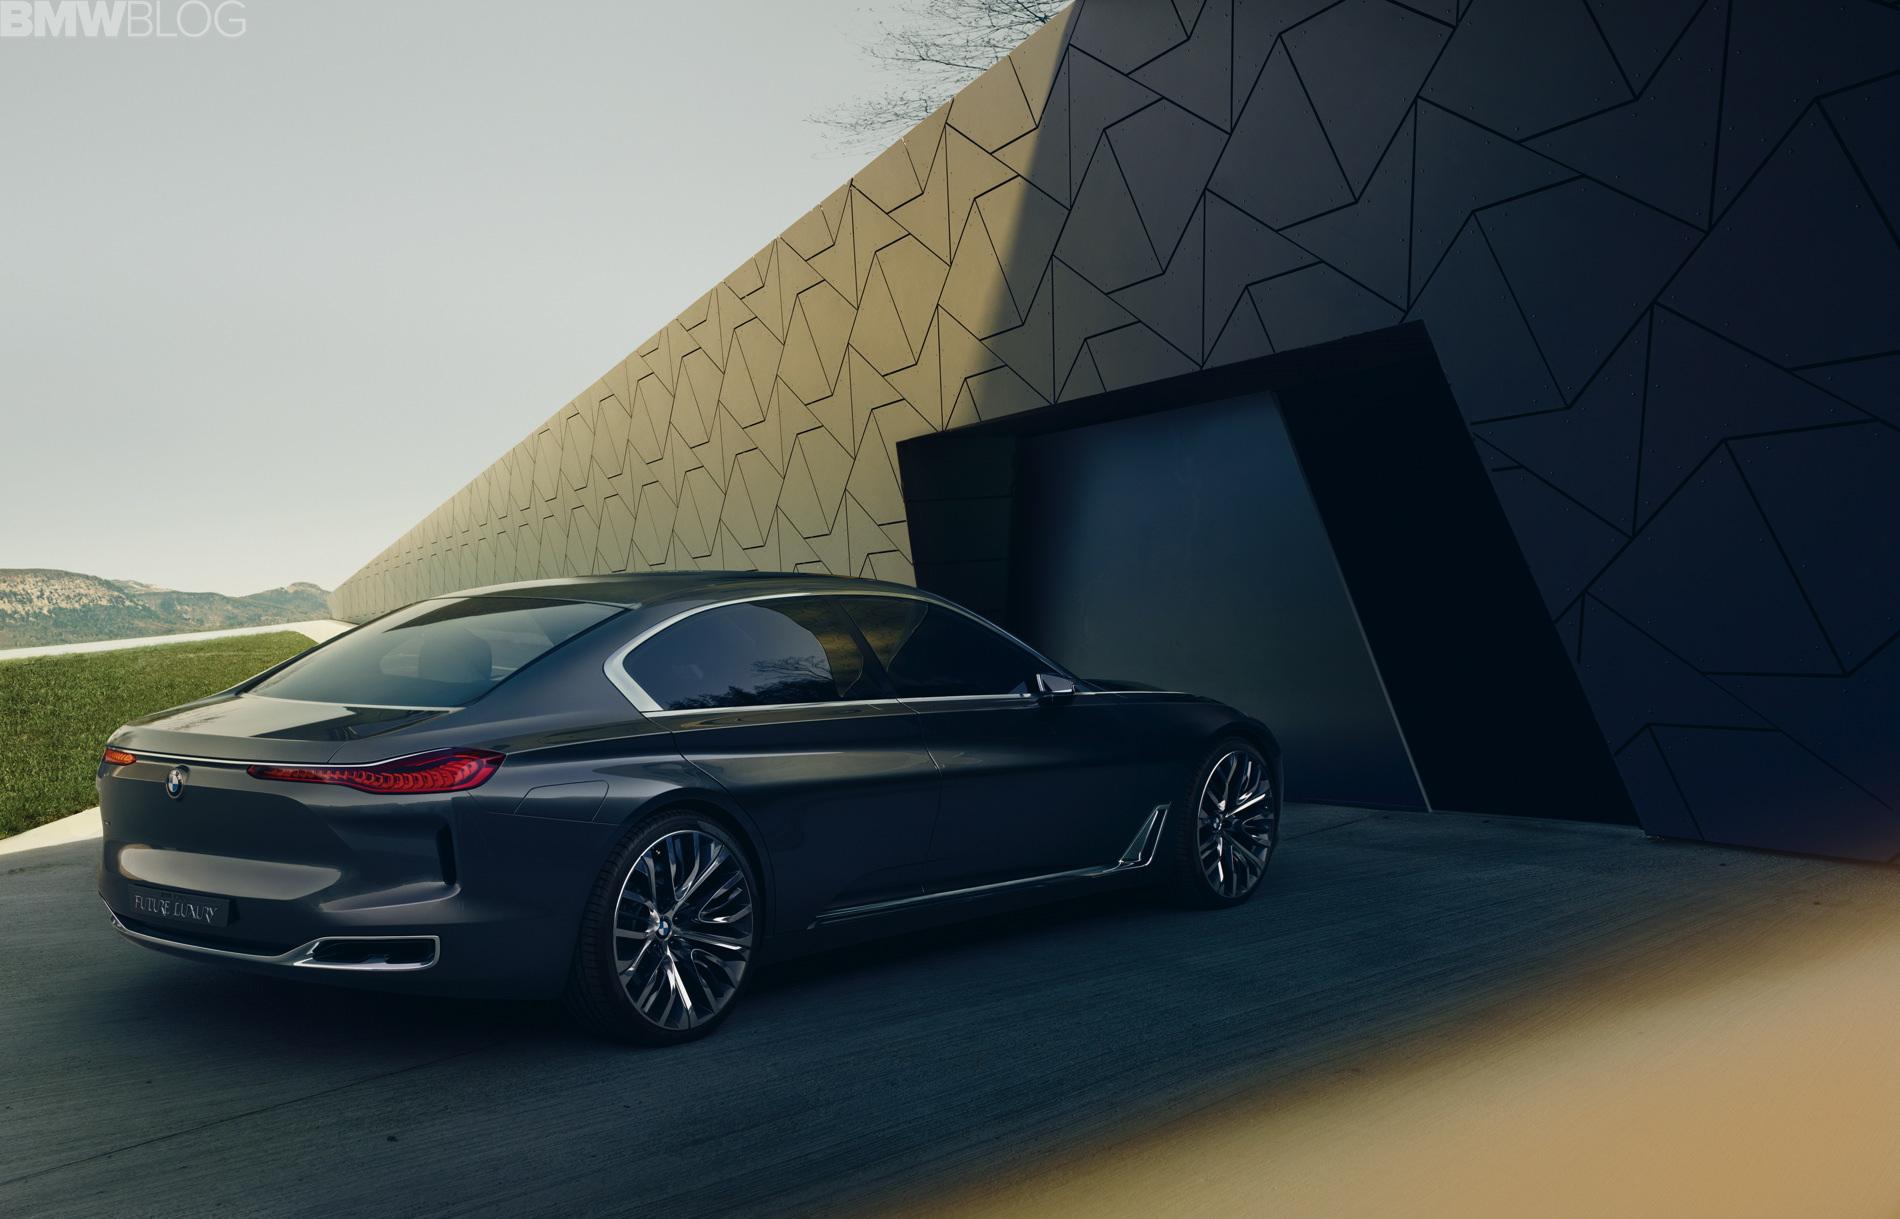 bmw-vision-future-luxury-38